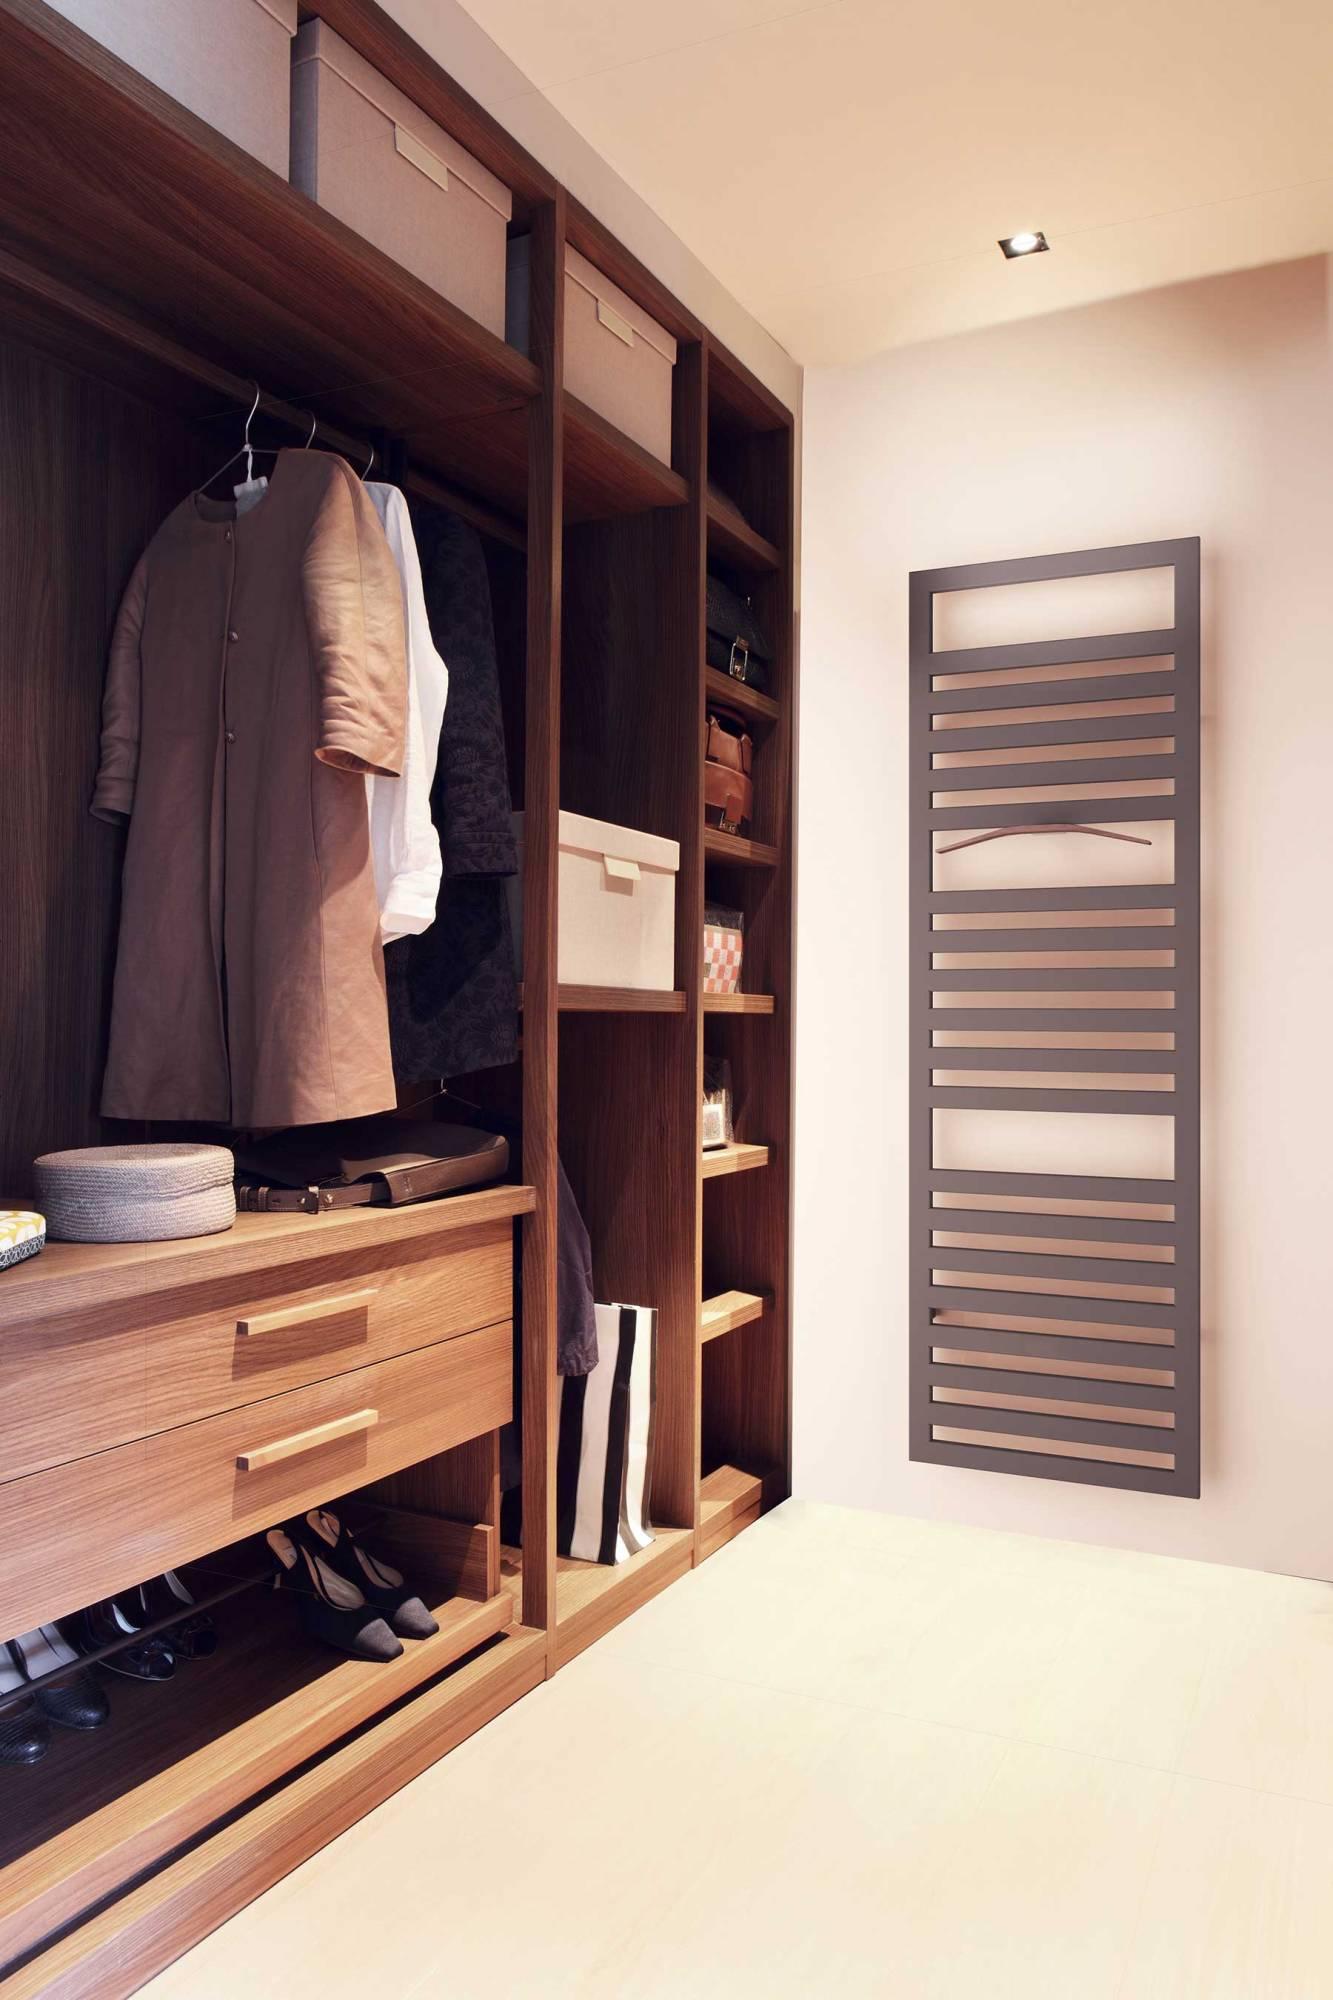 sèche-serviettes URBINO_tobacco_ambiance_dressingroom